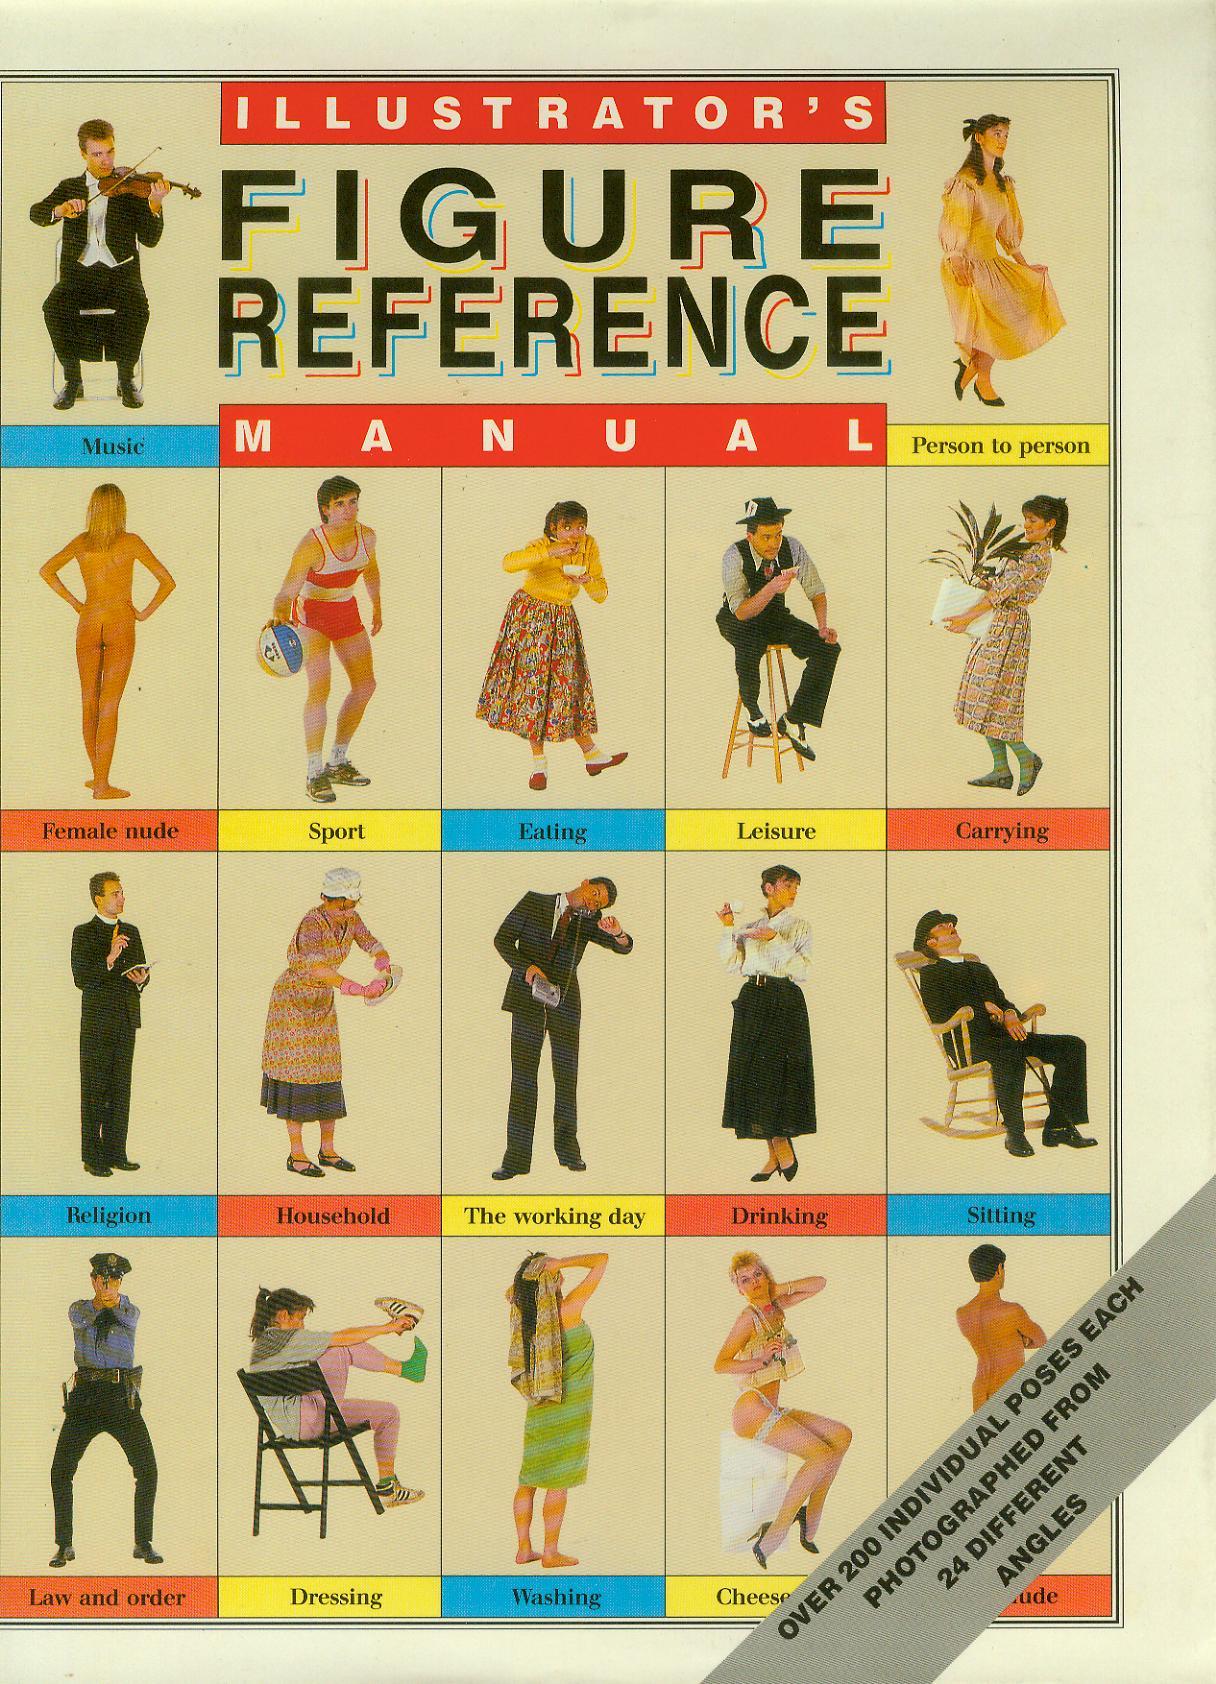 Illustrator's Figure Reference Manual